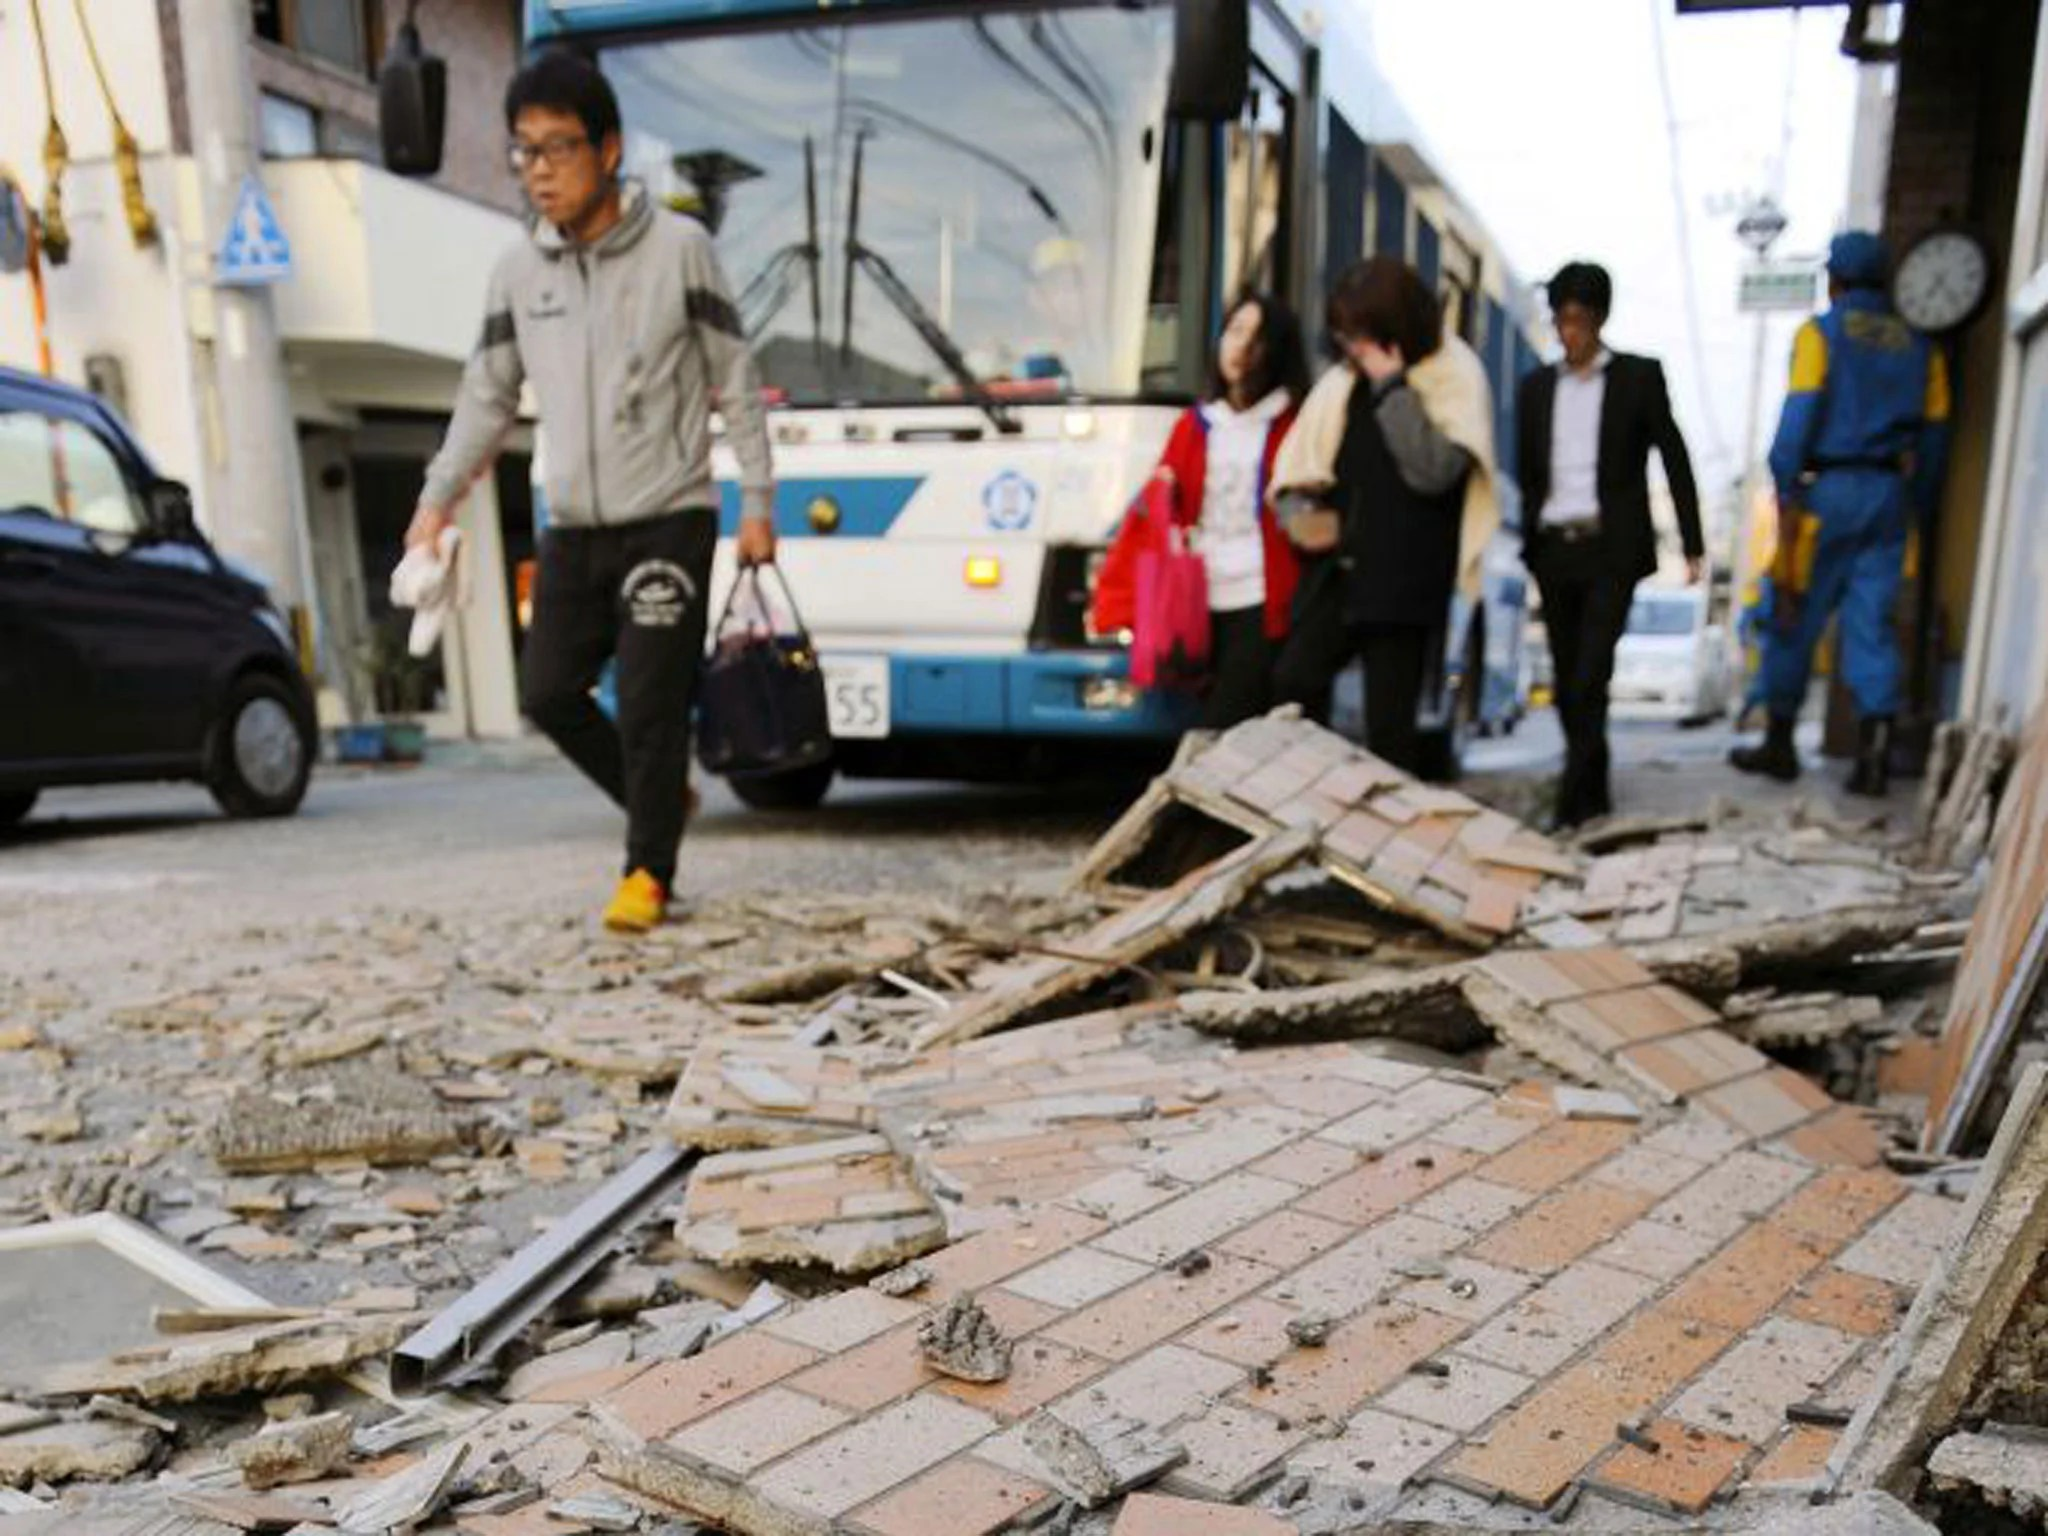 Japan Earthquakes Survivor Describes Dramatic Escape From Seventh Floor Of Damaged Building